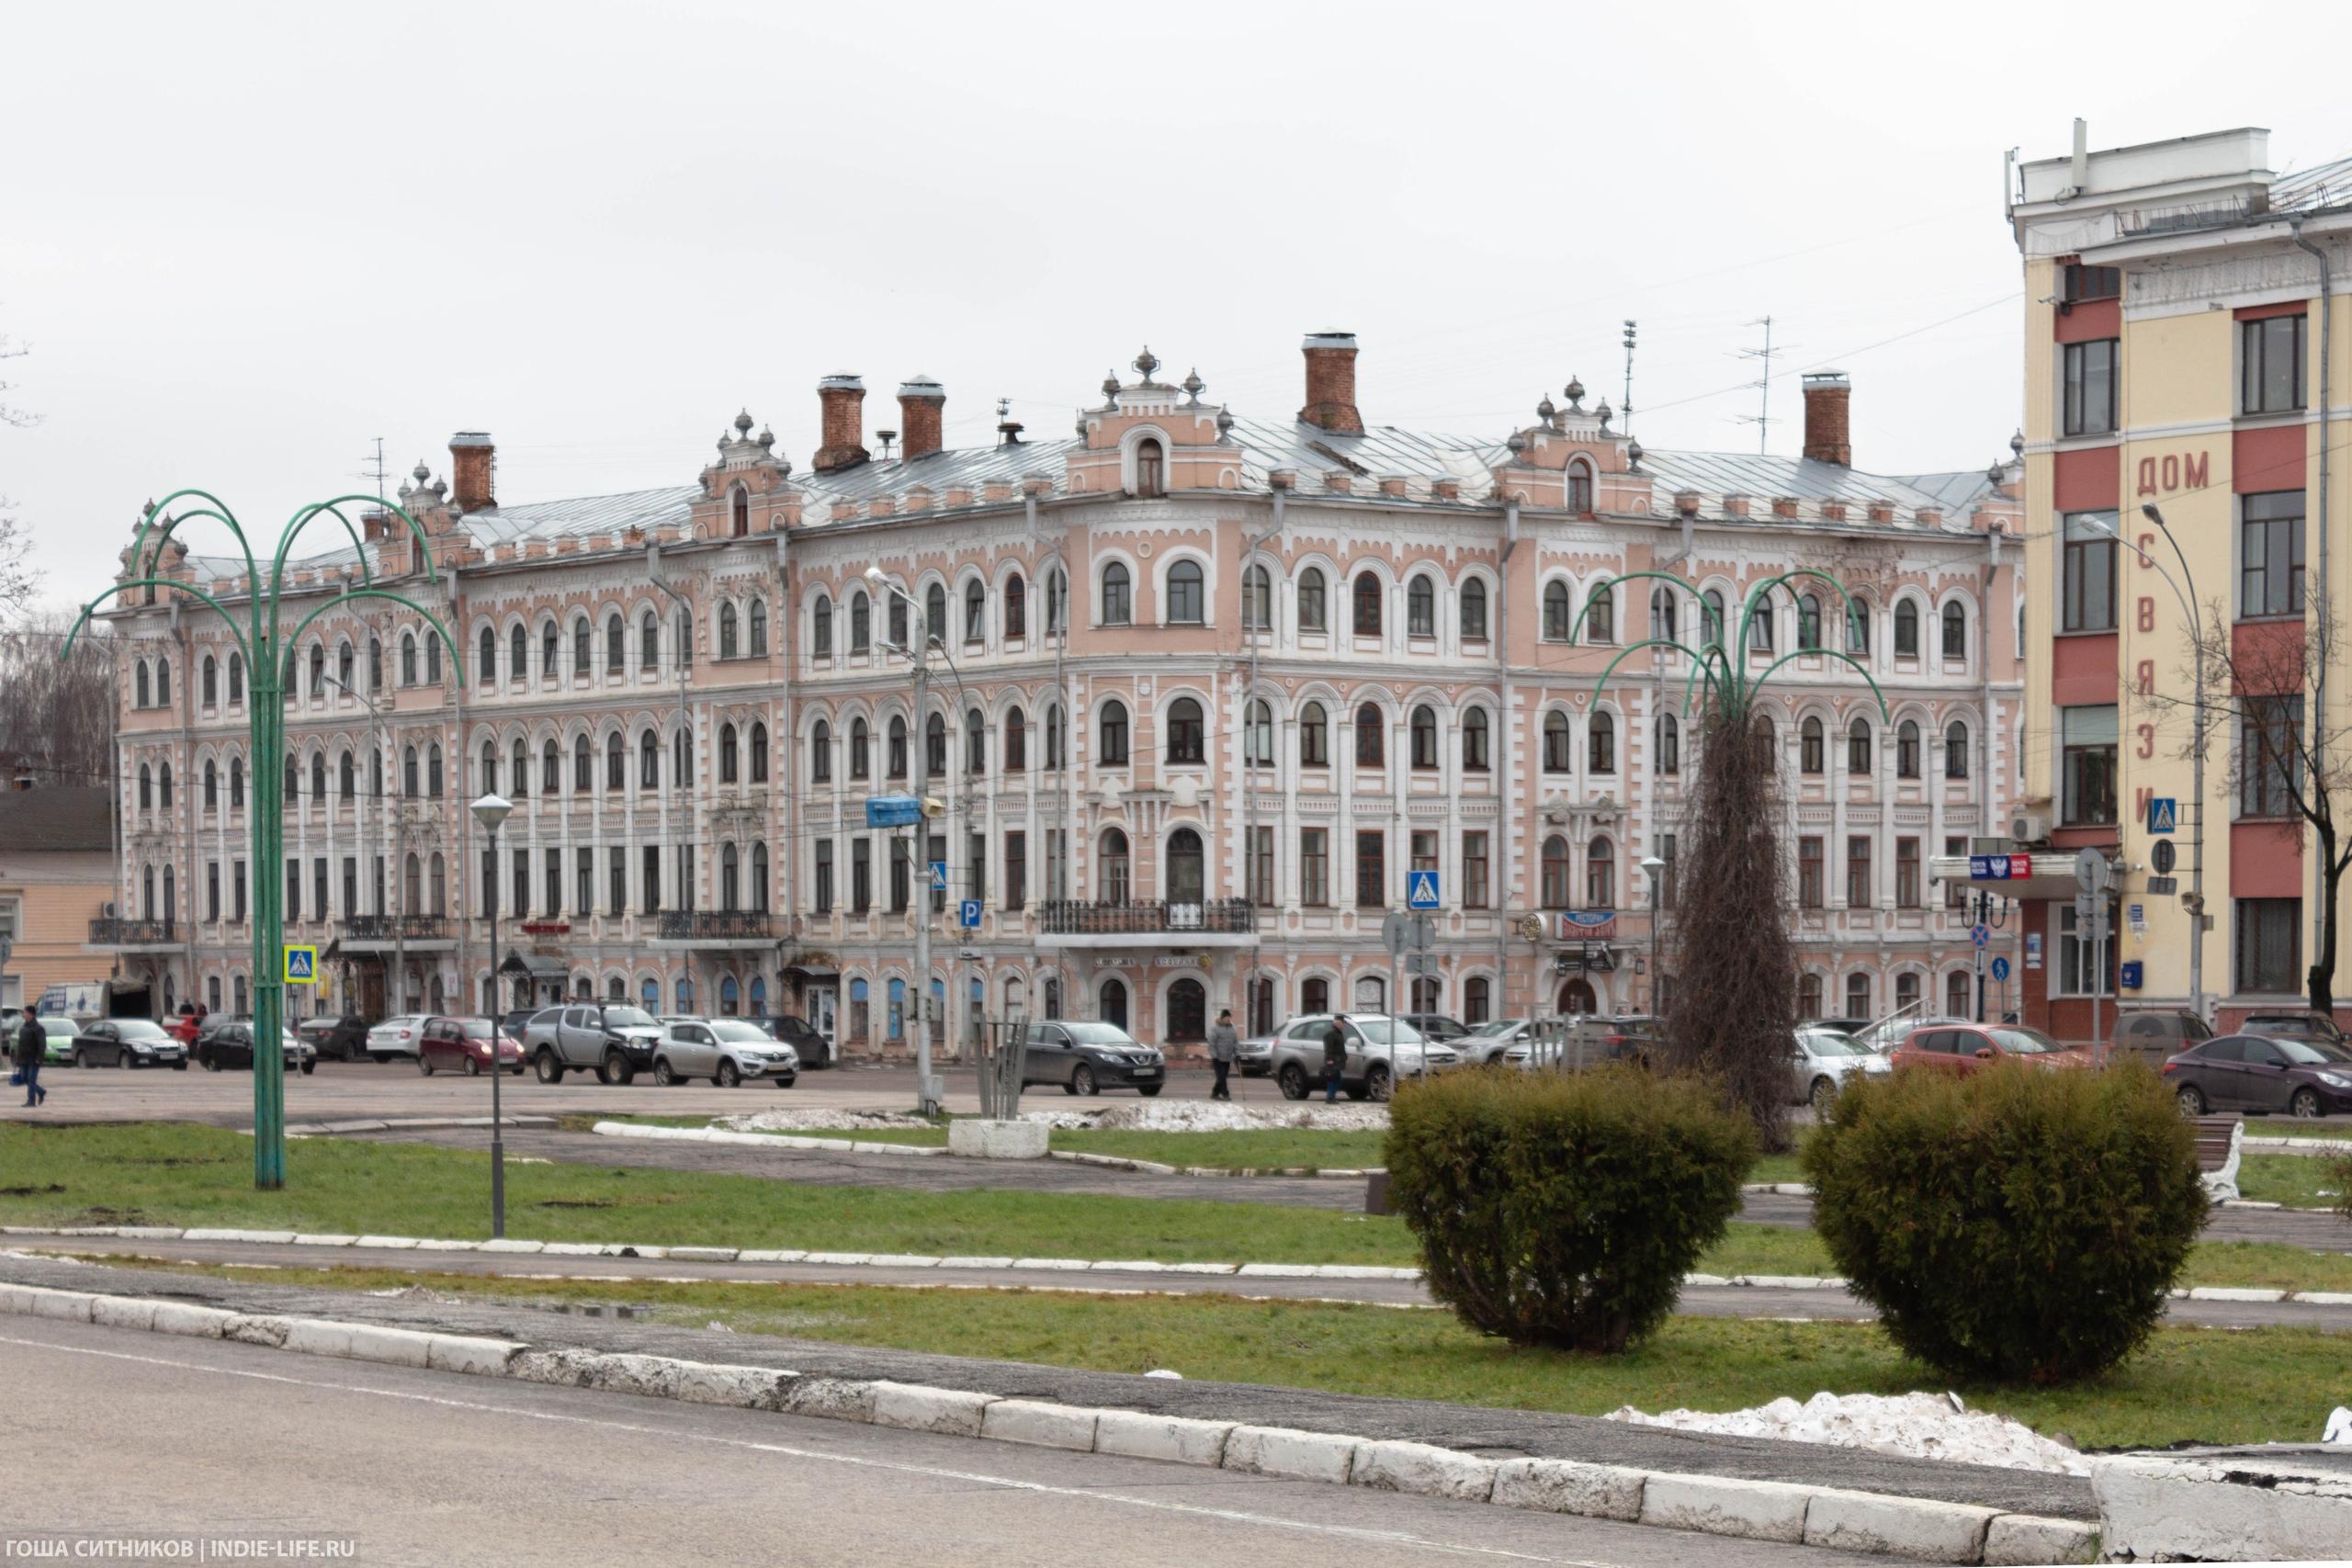 Красивое здание 19 века